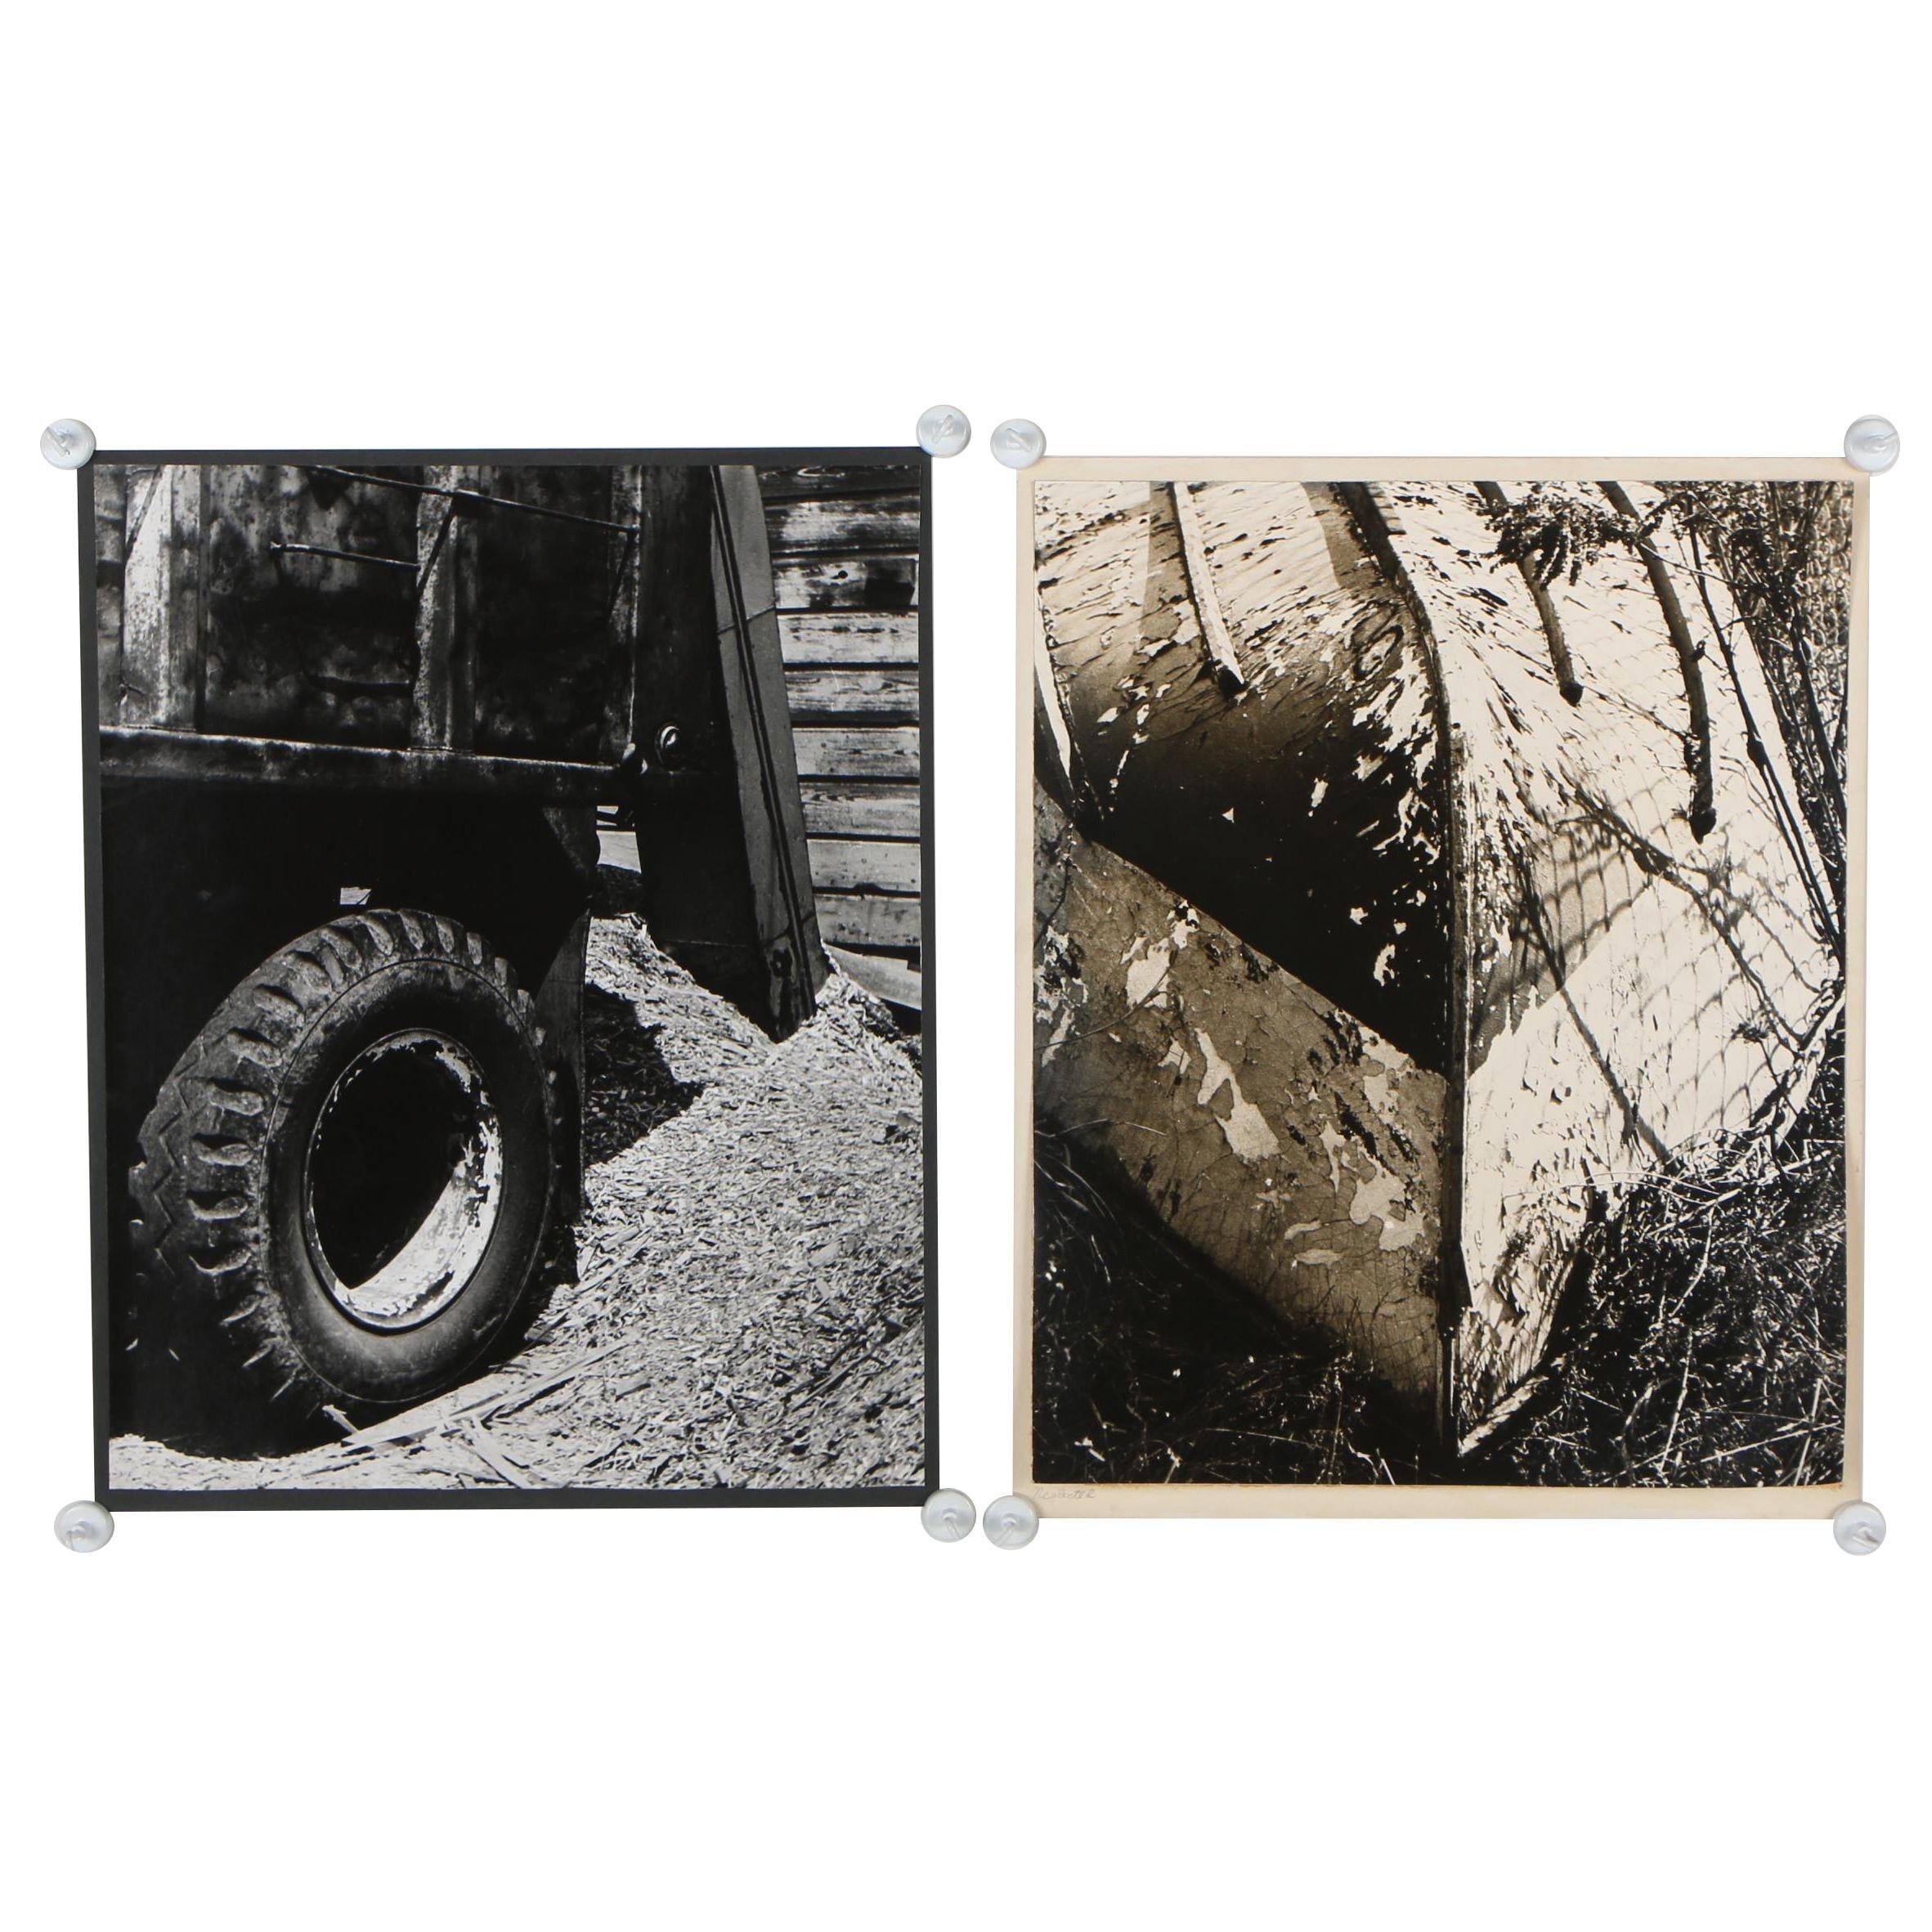 "Warren Geib Silver Gelatins Photographs ""Neglected"" and ""Truck Detail"""